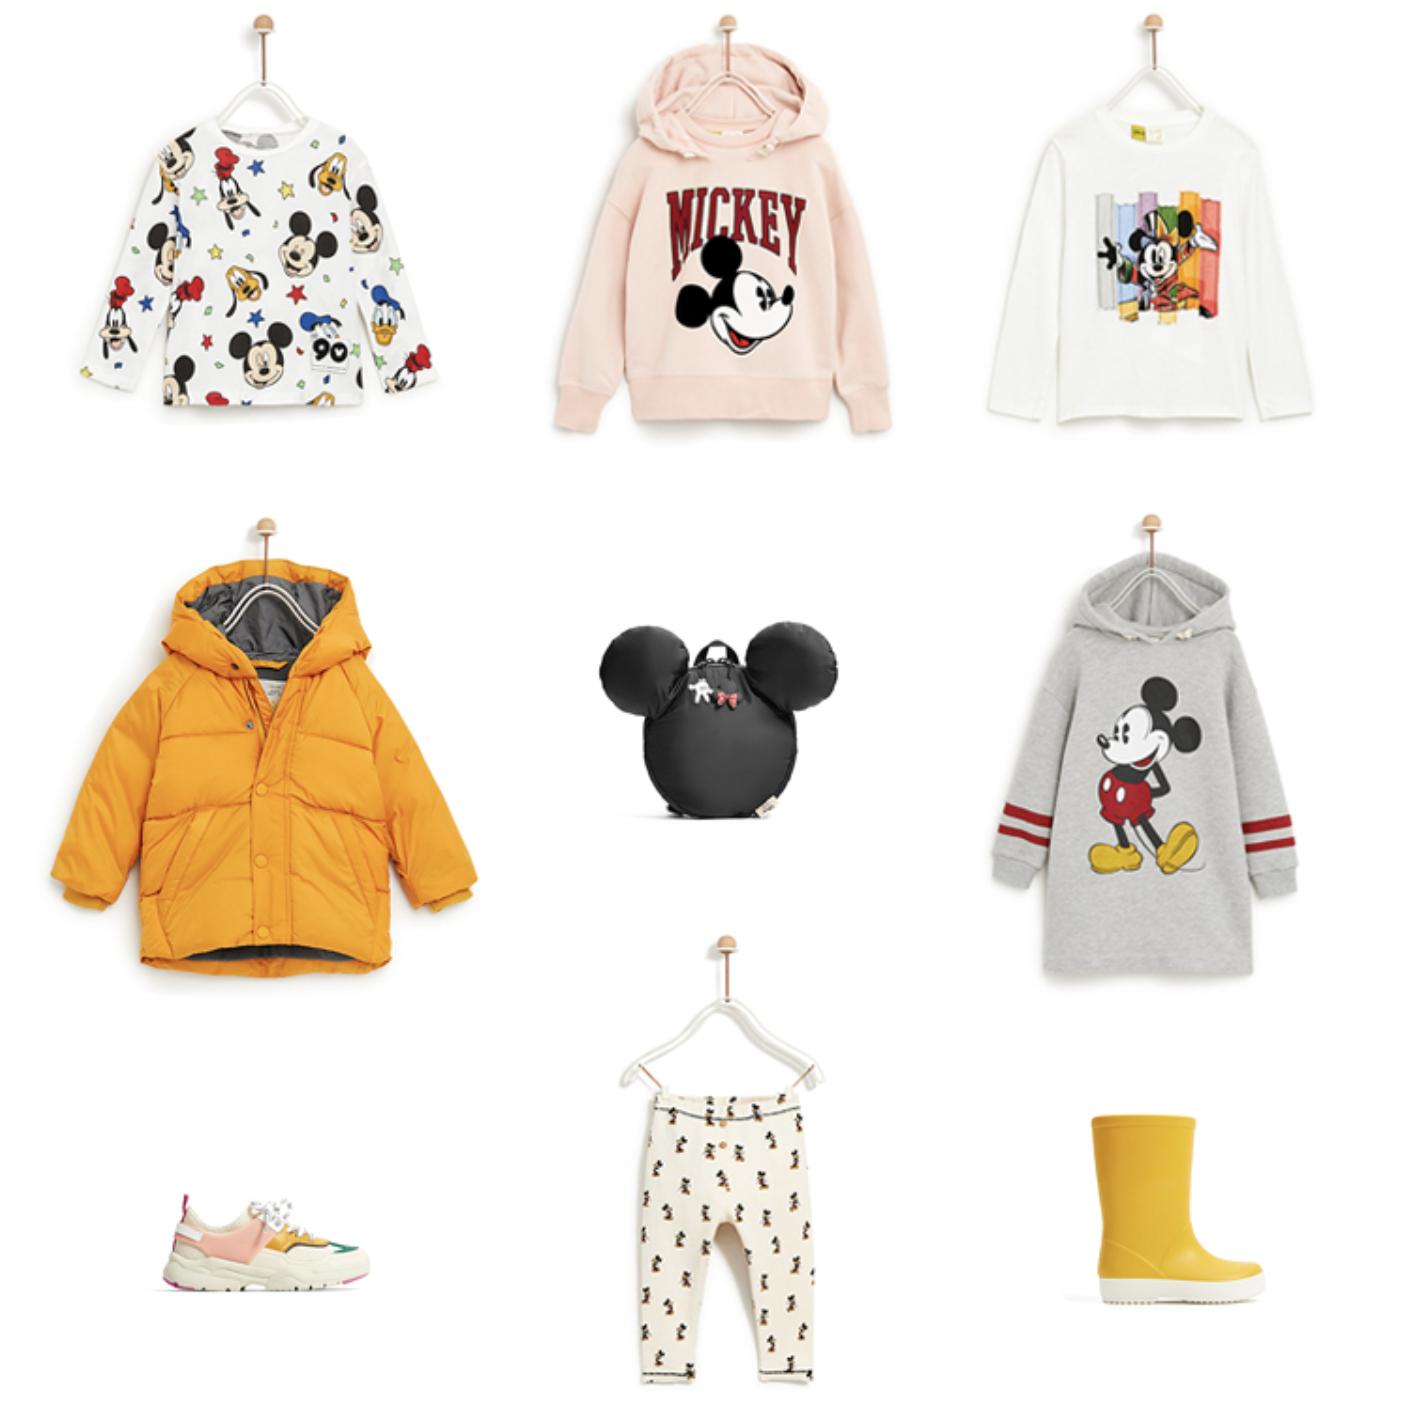 Mickey Mouse Verjaardag Onlinelifestylemagazine Kinderfavorites Com